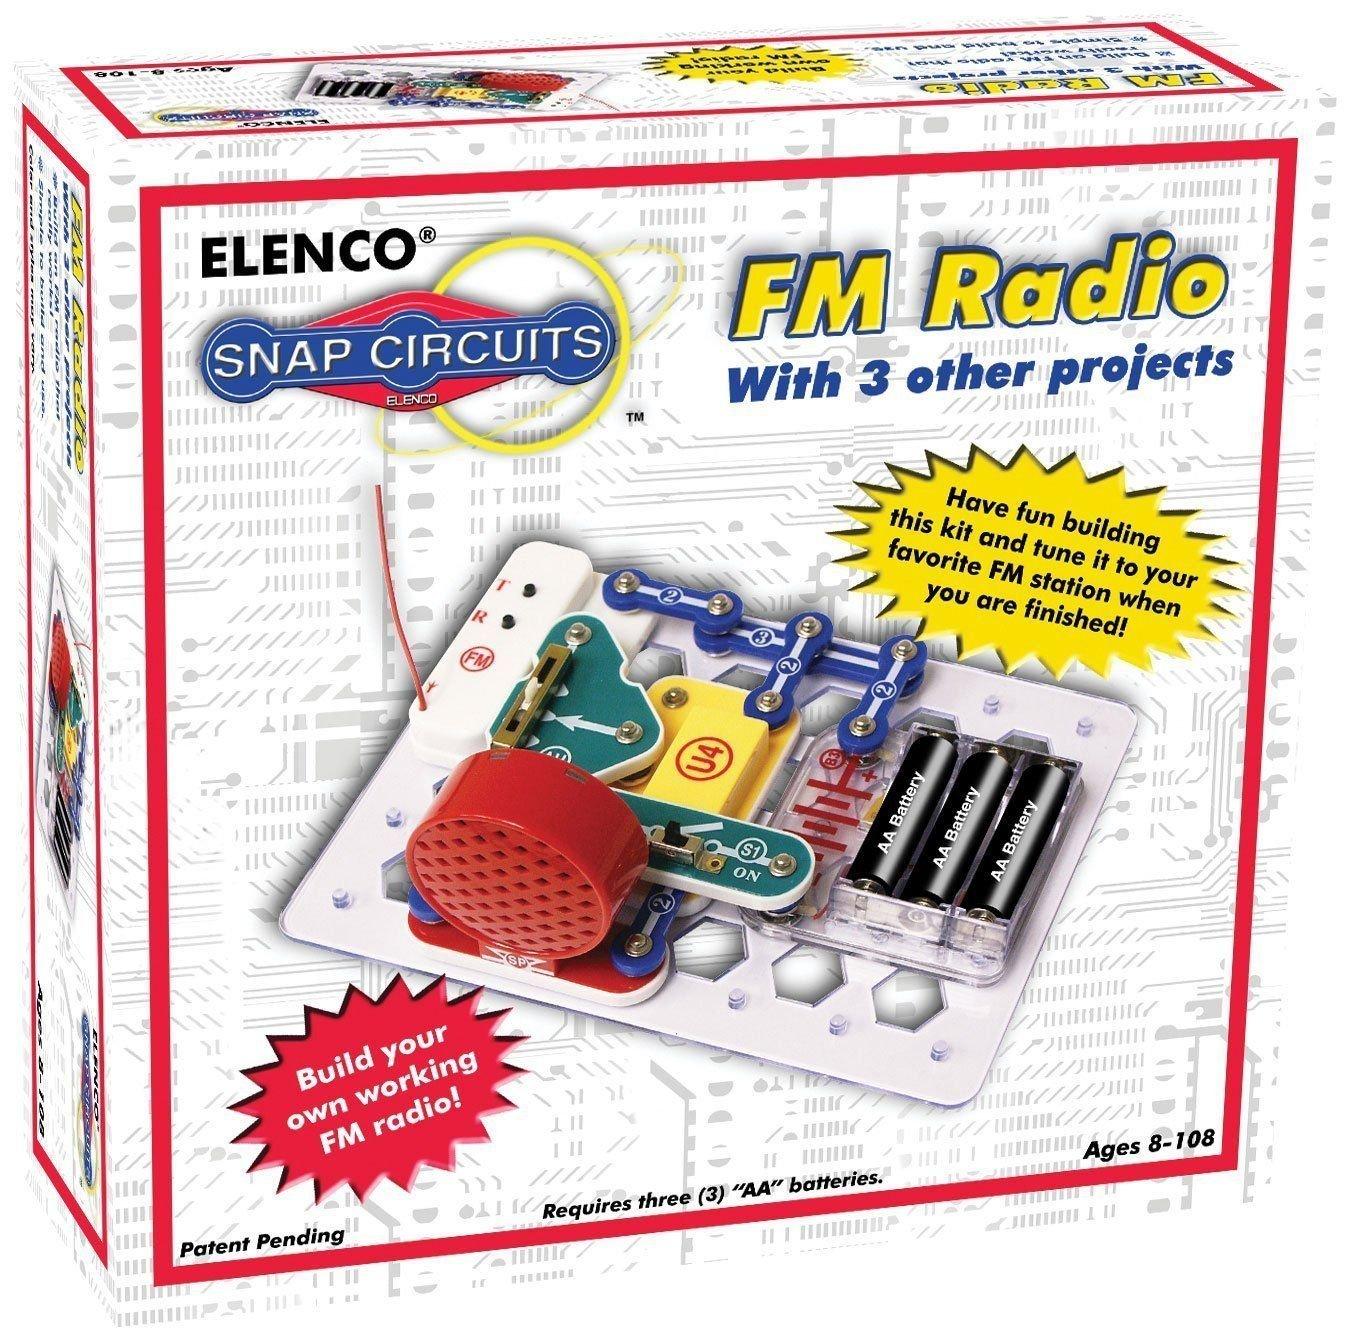 (USA Warehouse) ELENCO Snap Circuits SCP-02 FM Radio Kit Ages 8+ VERY POPULARITEM#NO: 43E8E-UFE6 C2A17226